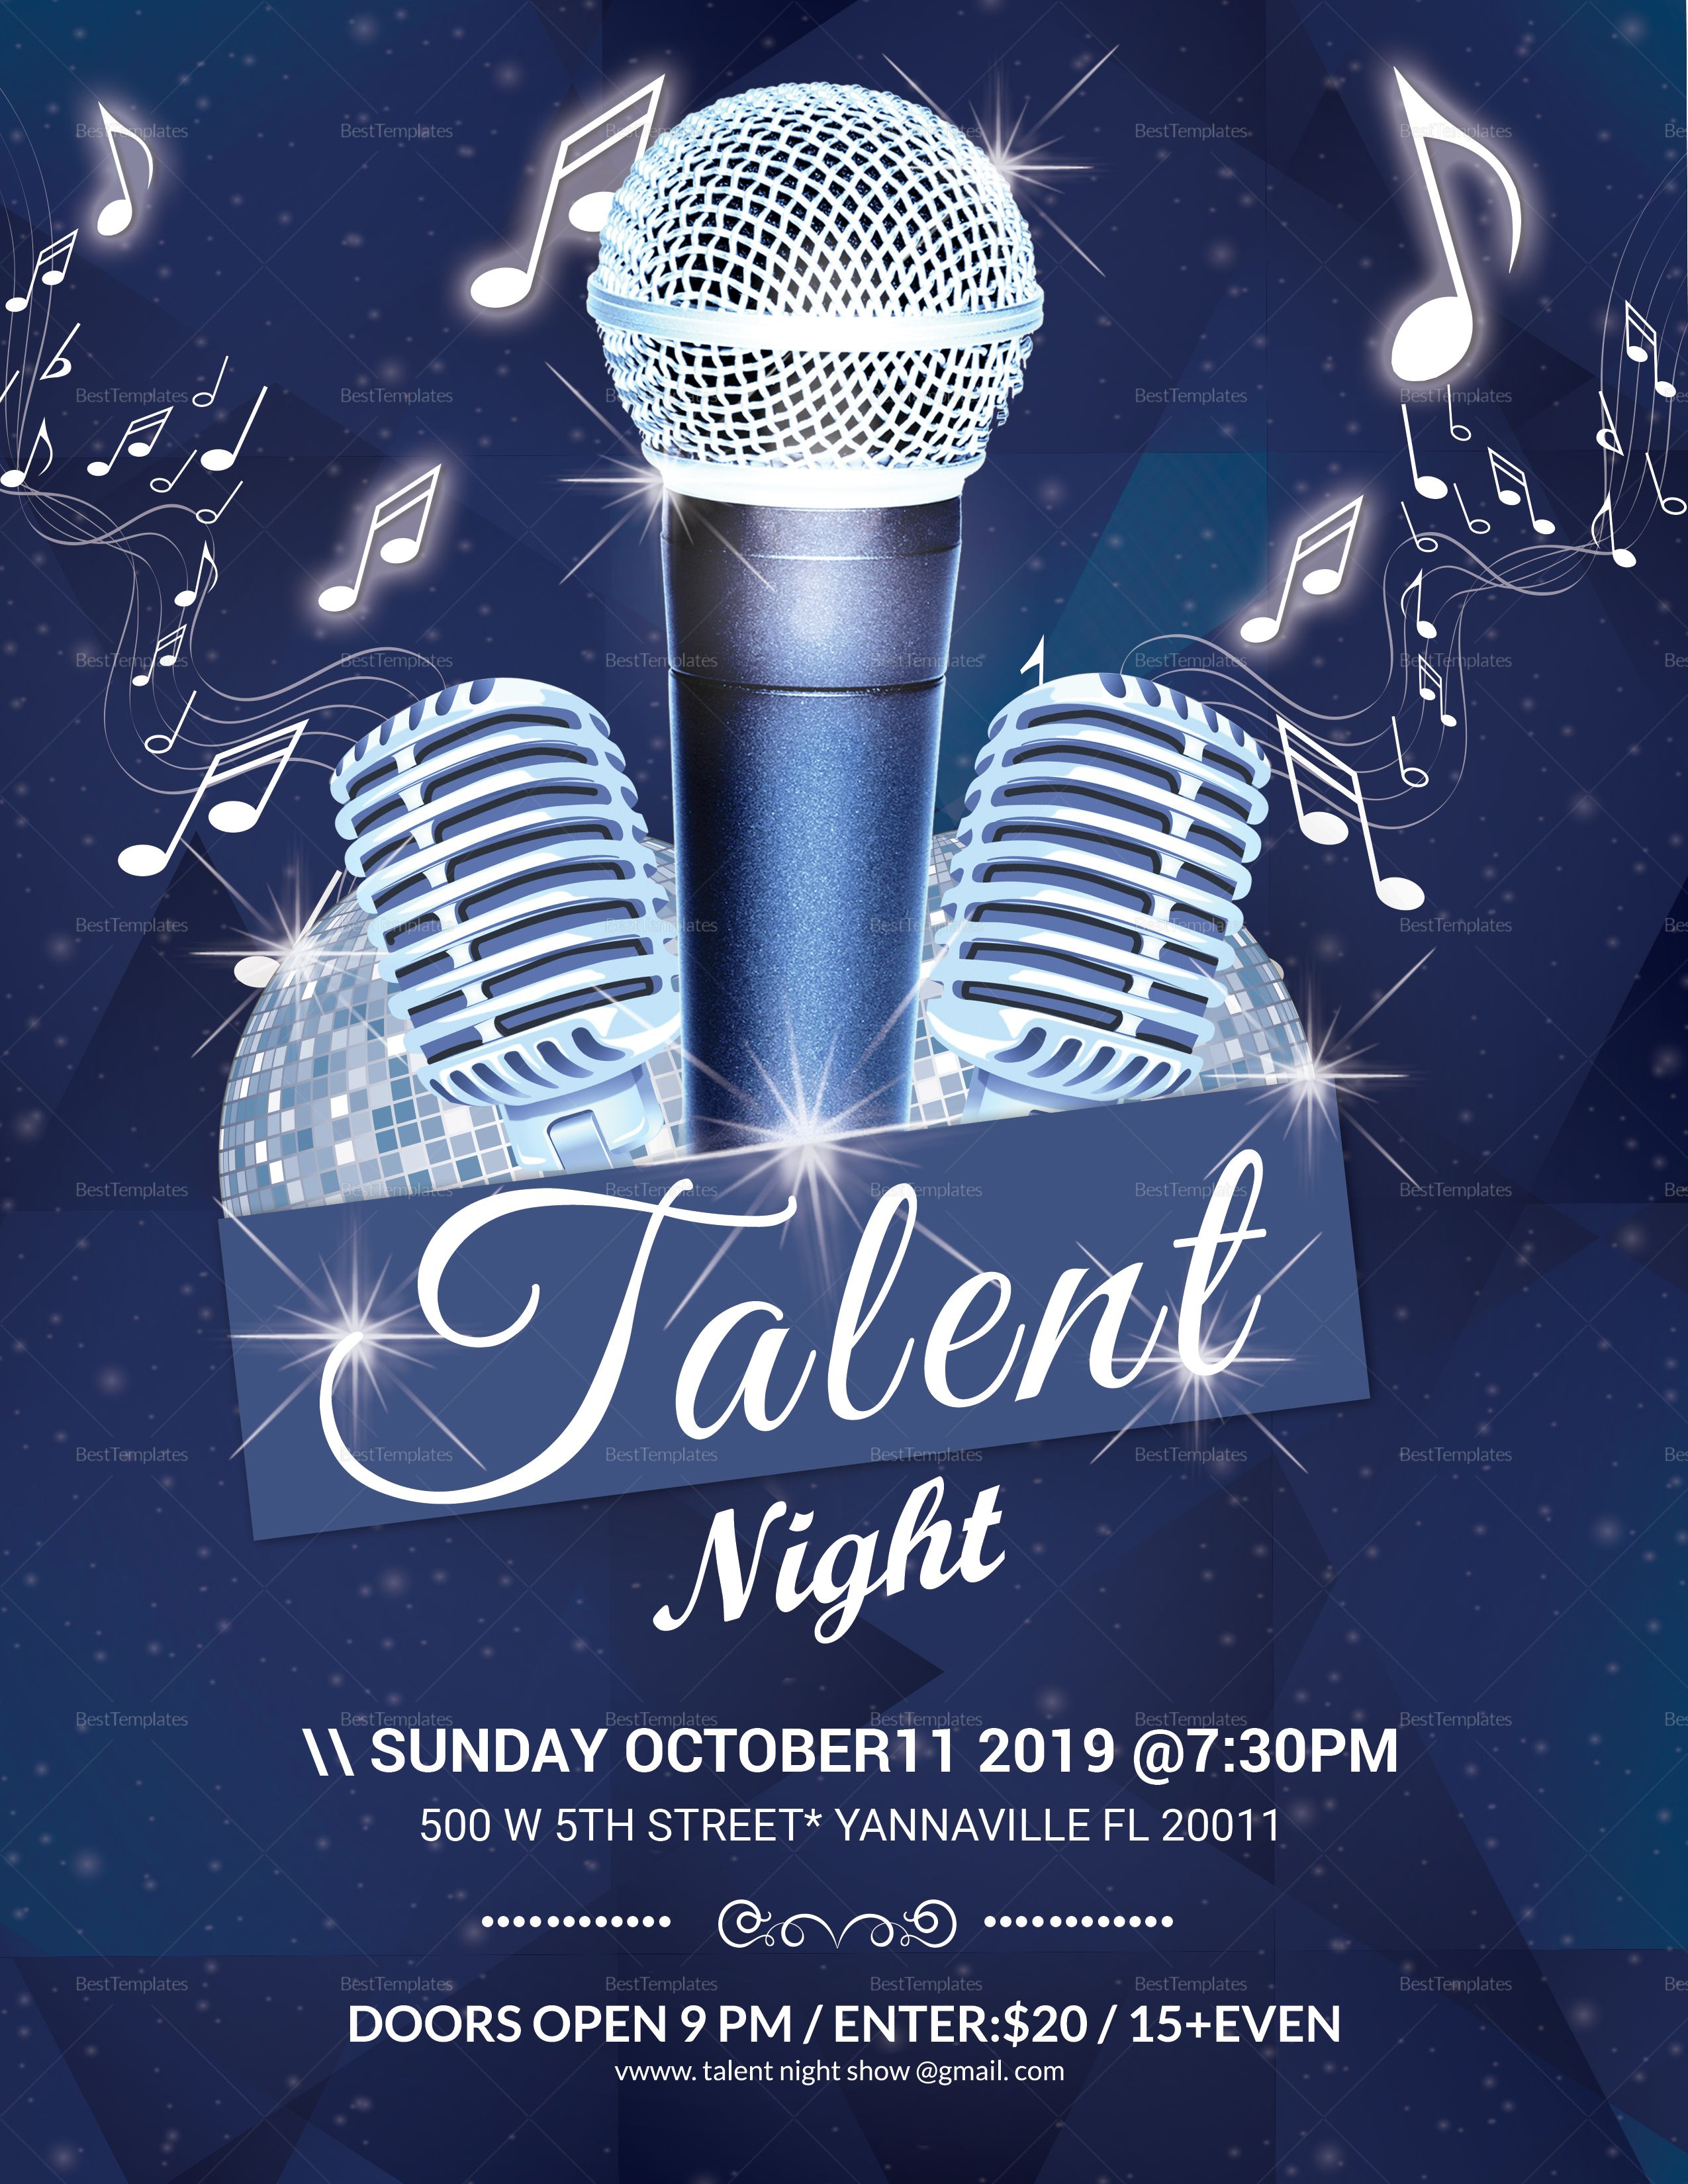 Talent Night Flyer Template Flyer Template Talent Show Flyer Free talent show flyer template